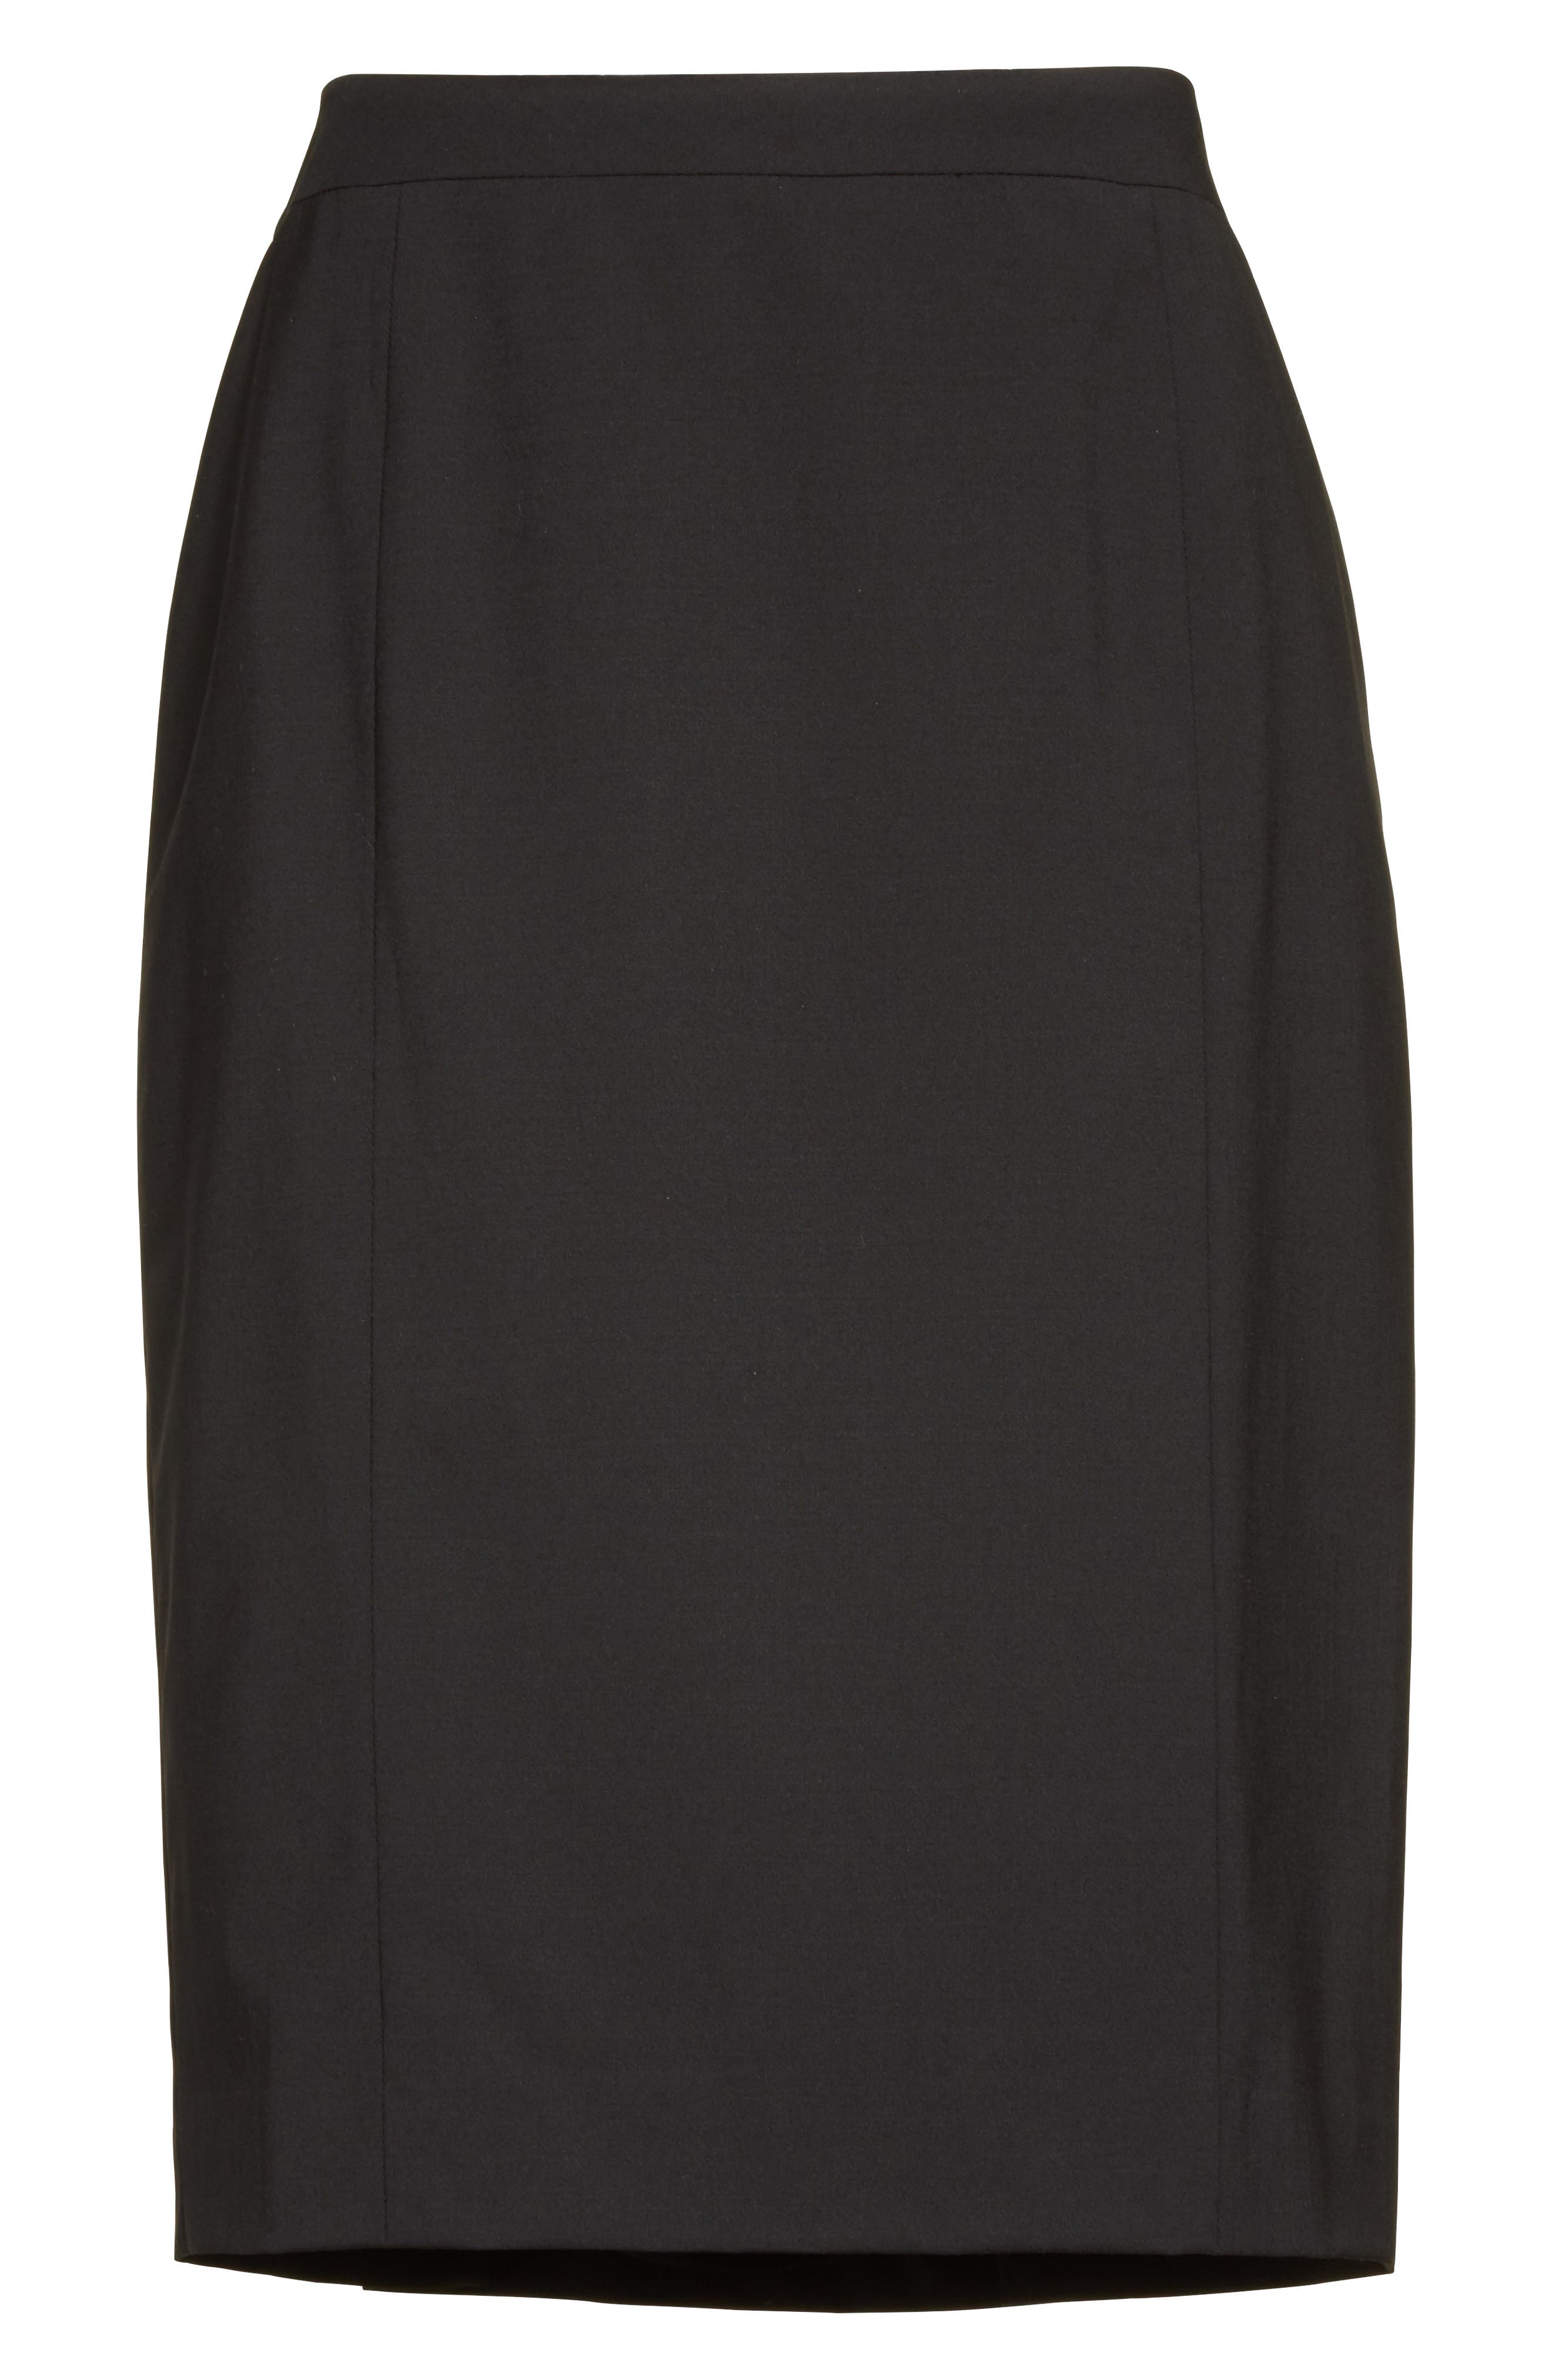 Stretch Wool Pencil Skirt,                             Alternate thumbnail 4, color,                             Black